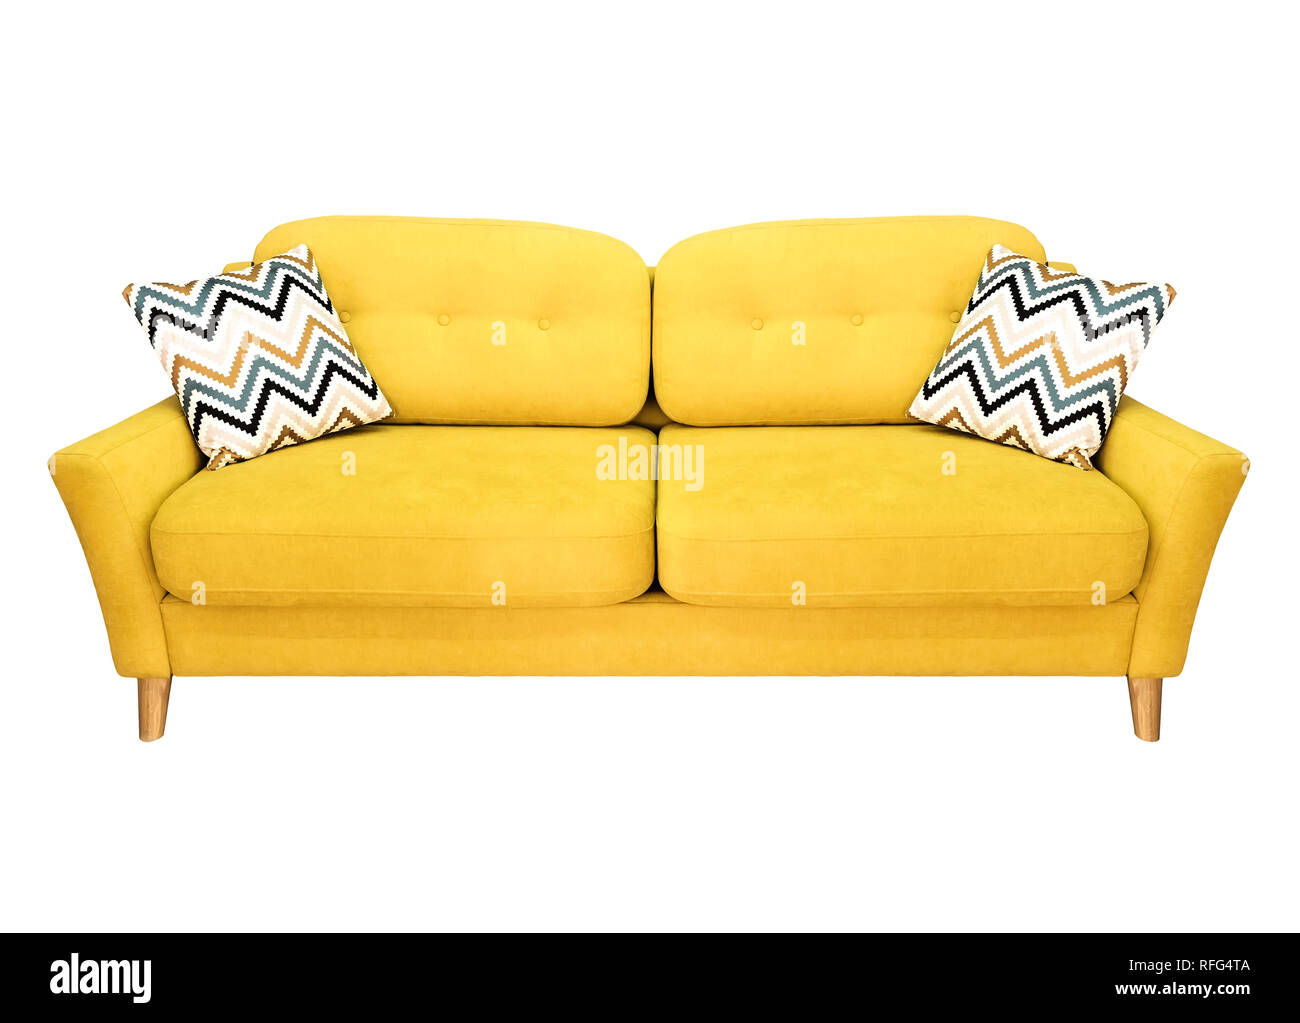 Green lemon yellow sofa with pillow. Soft lemon couch ...